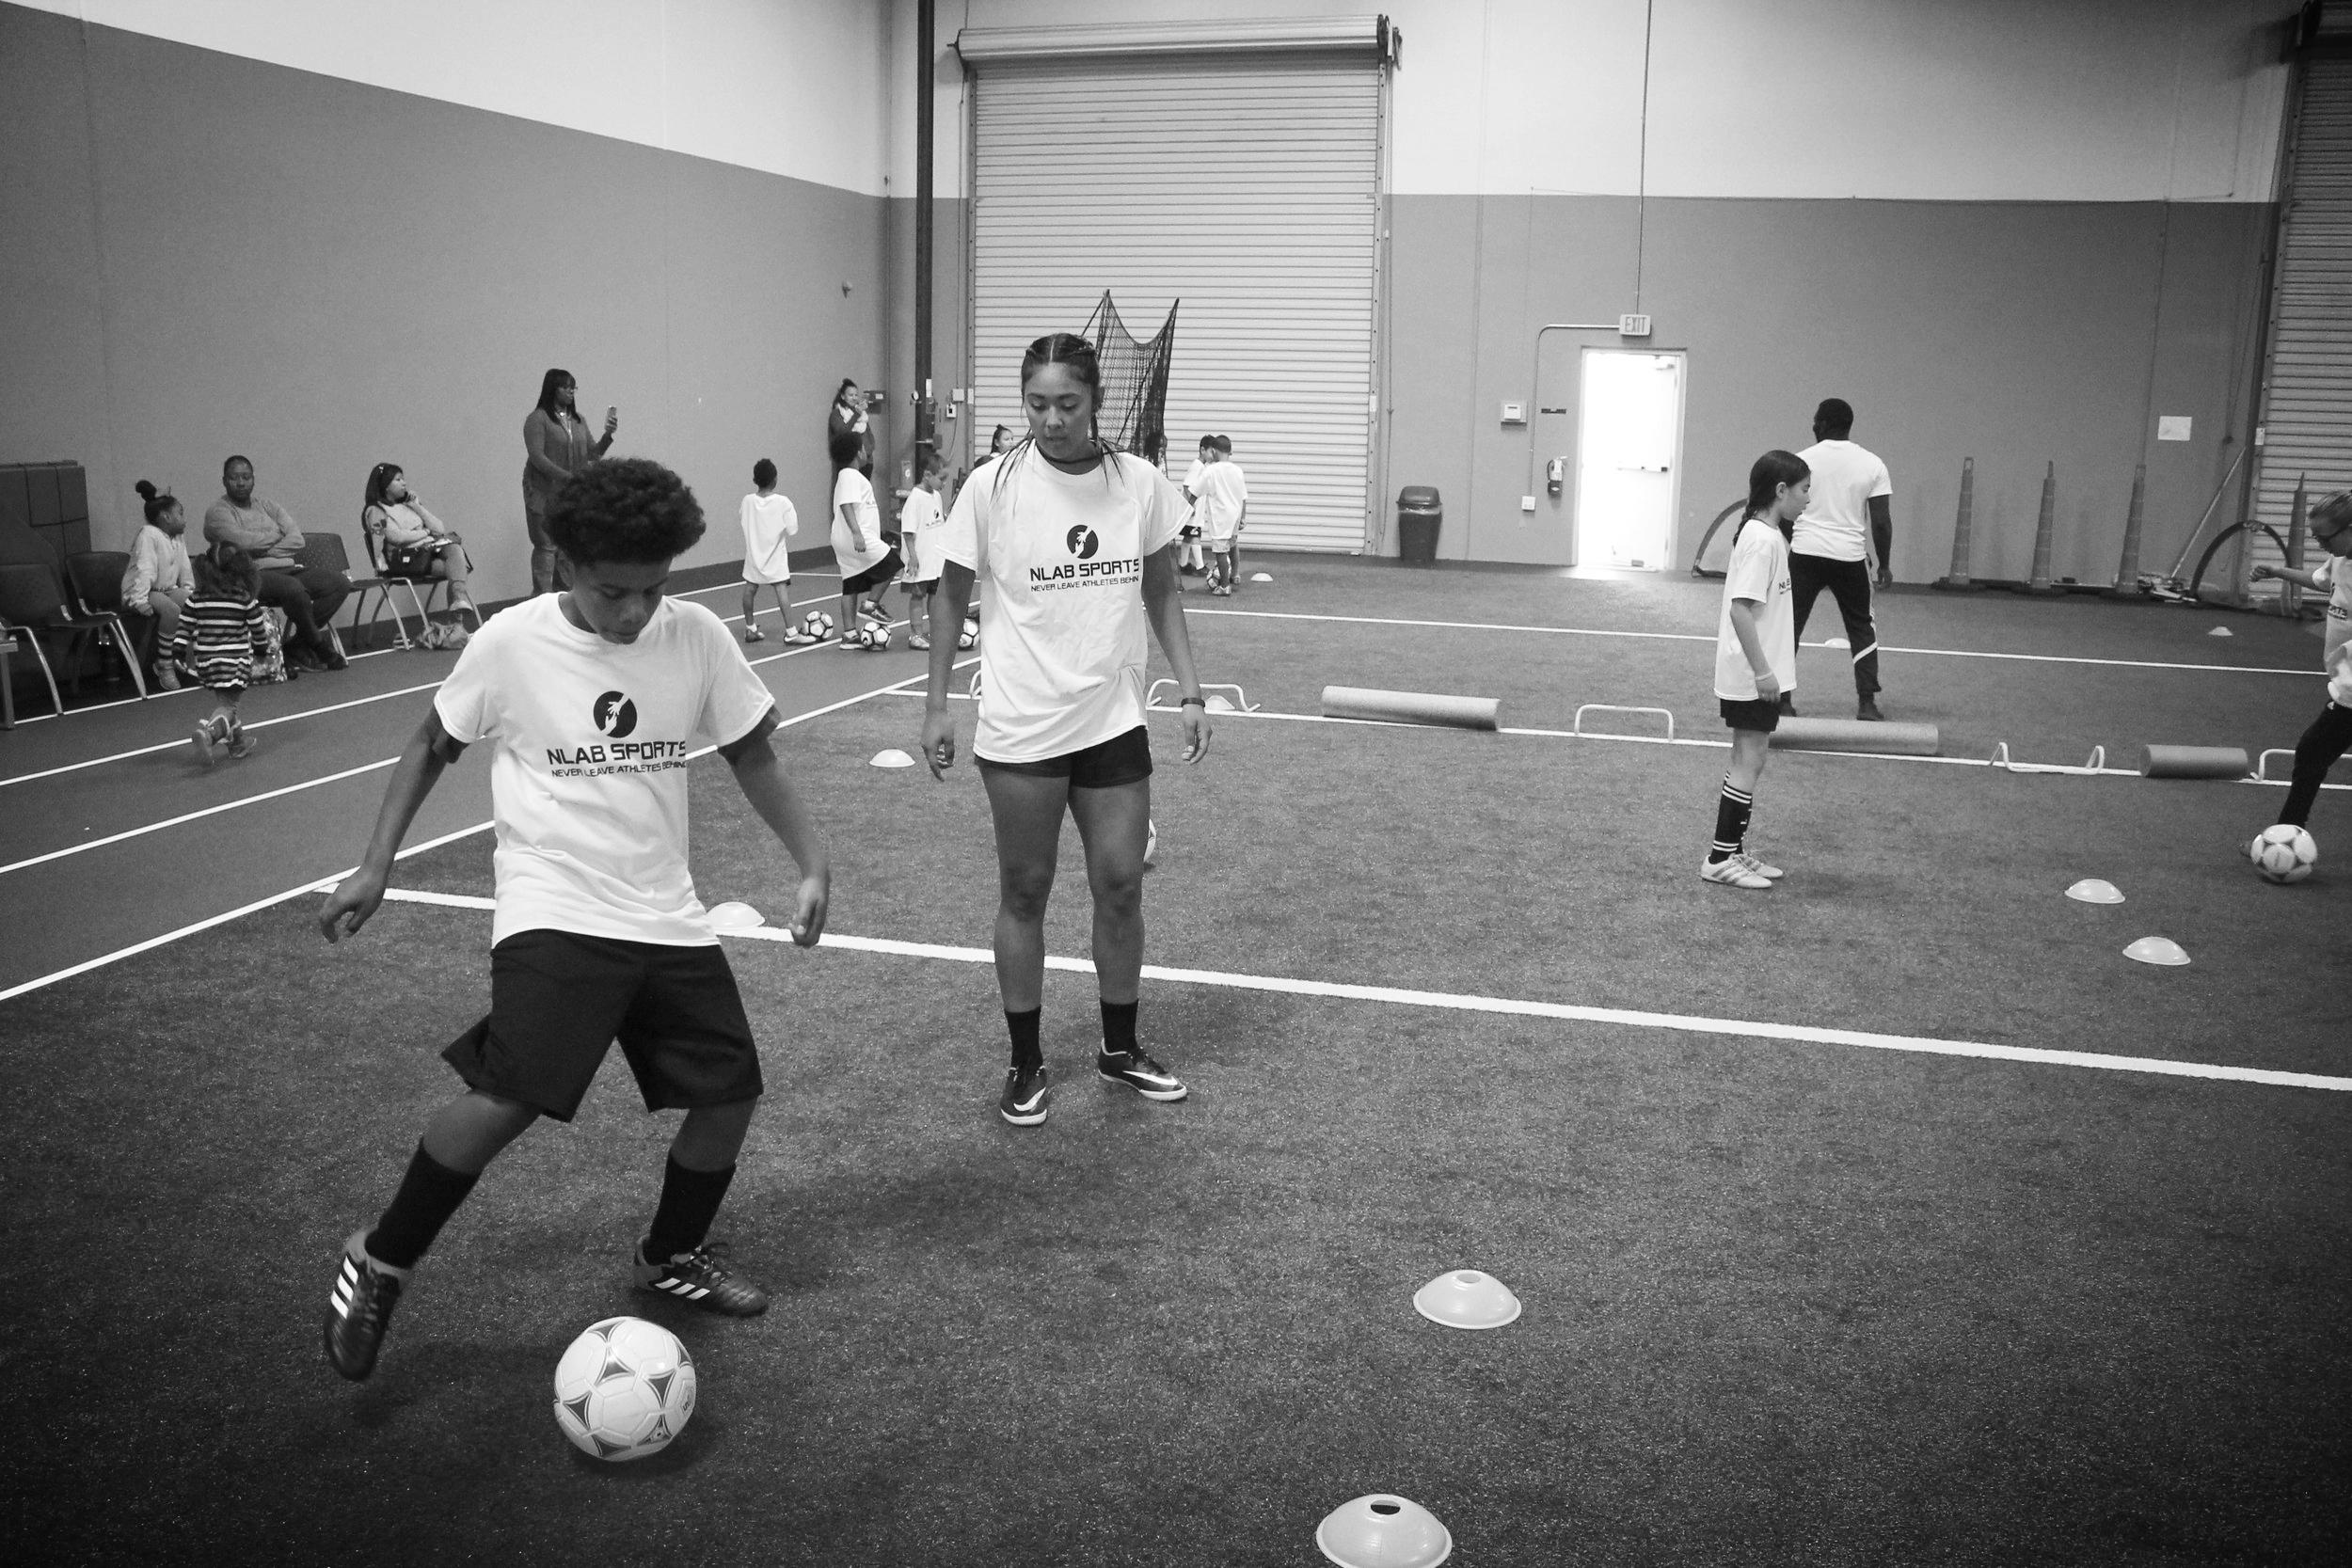 nlab soccer